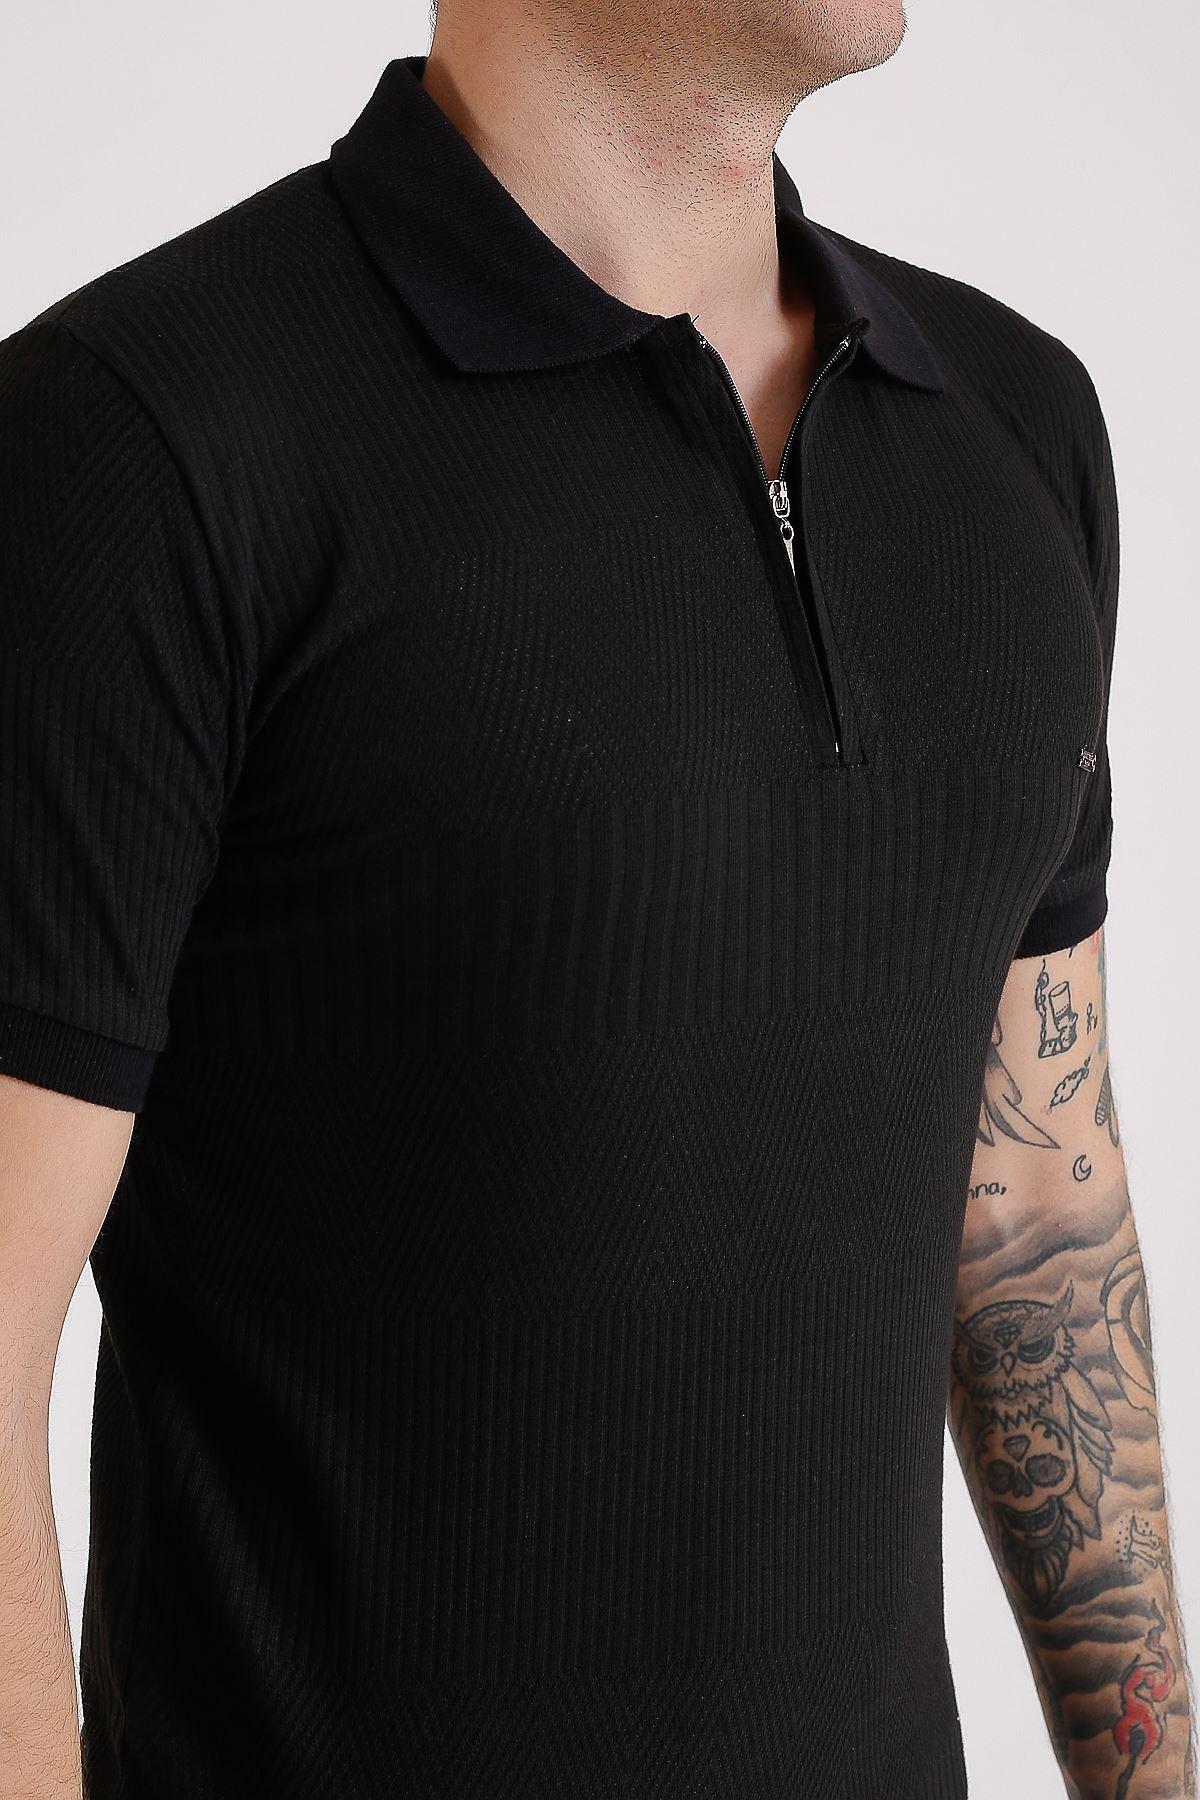 Erkek Polo yaka Desenli Örme Siyah T-Shirt